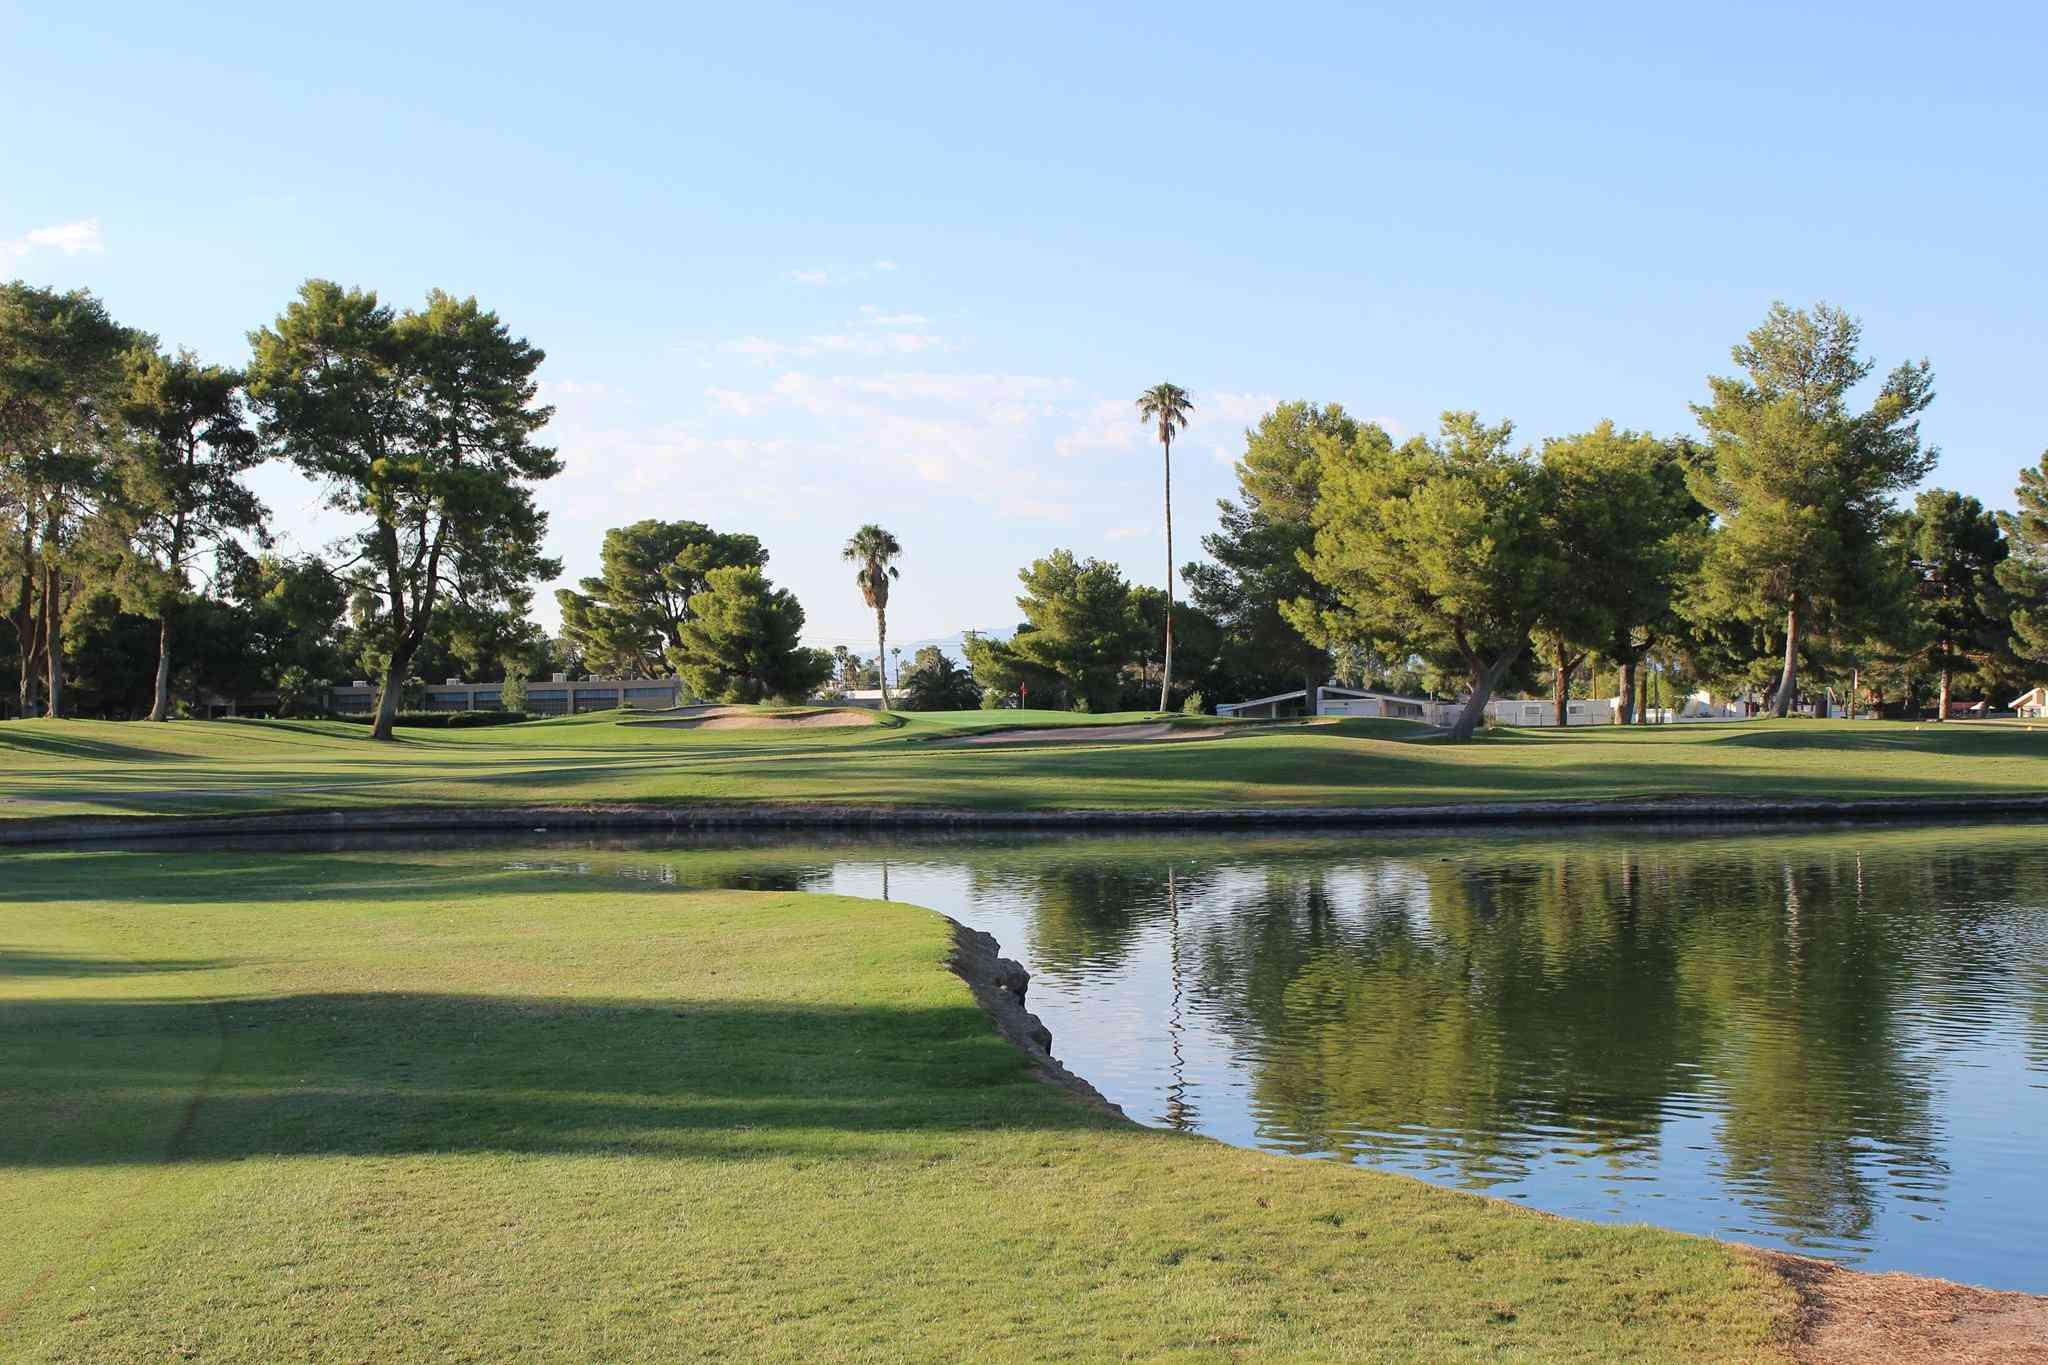 Pond at Las Vegas National Golf Club